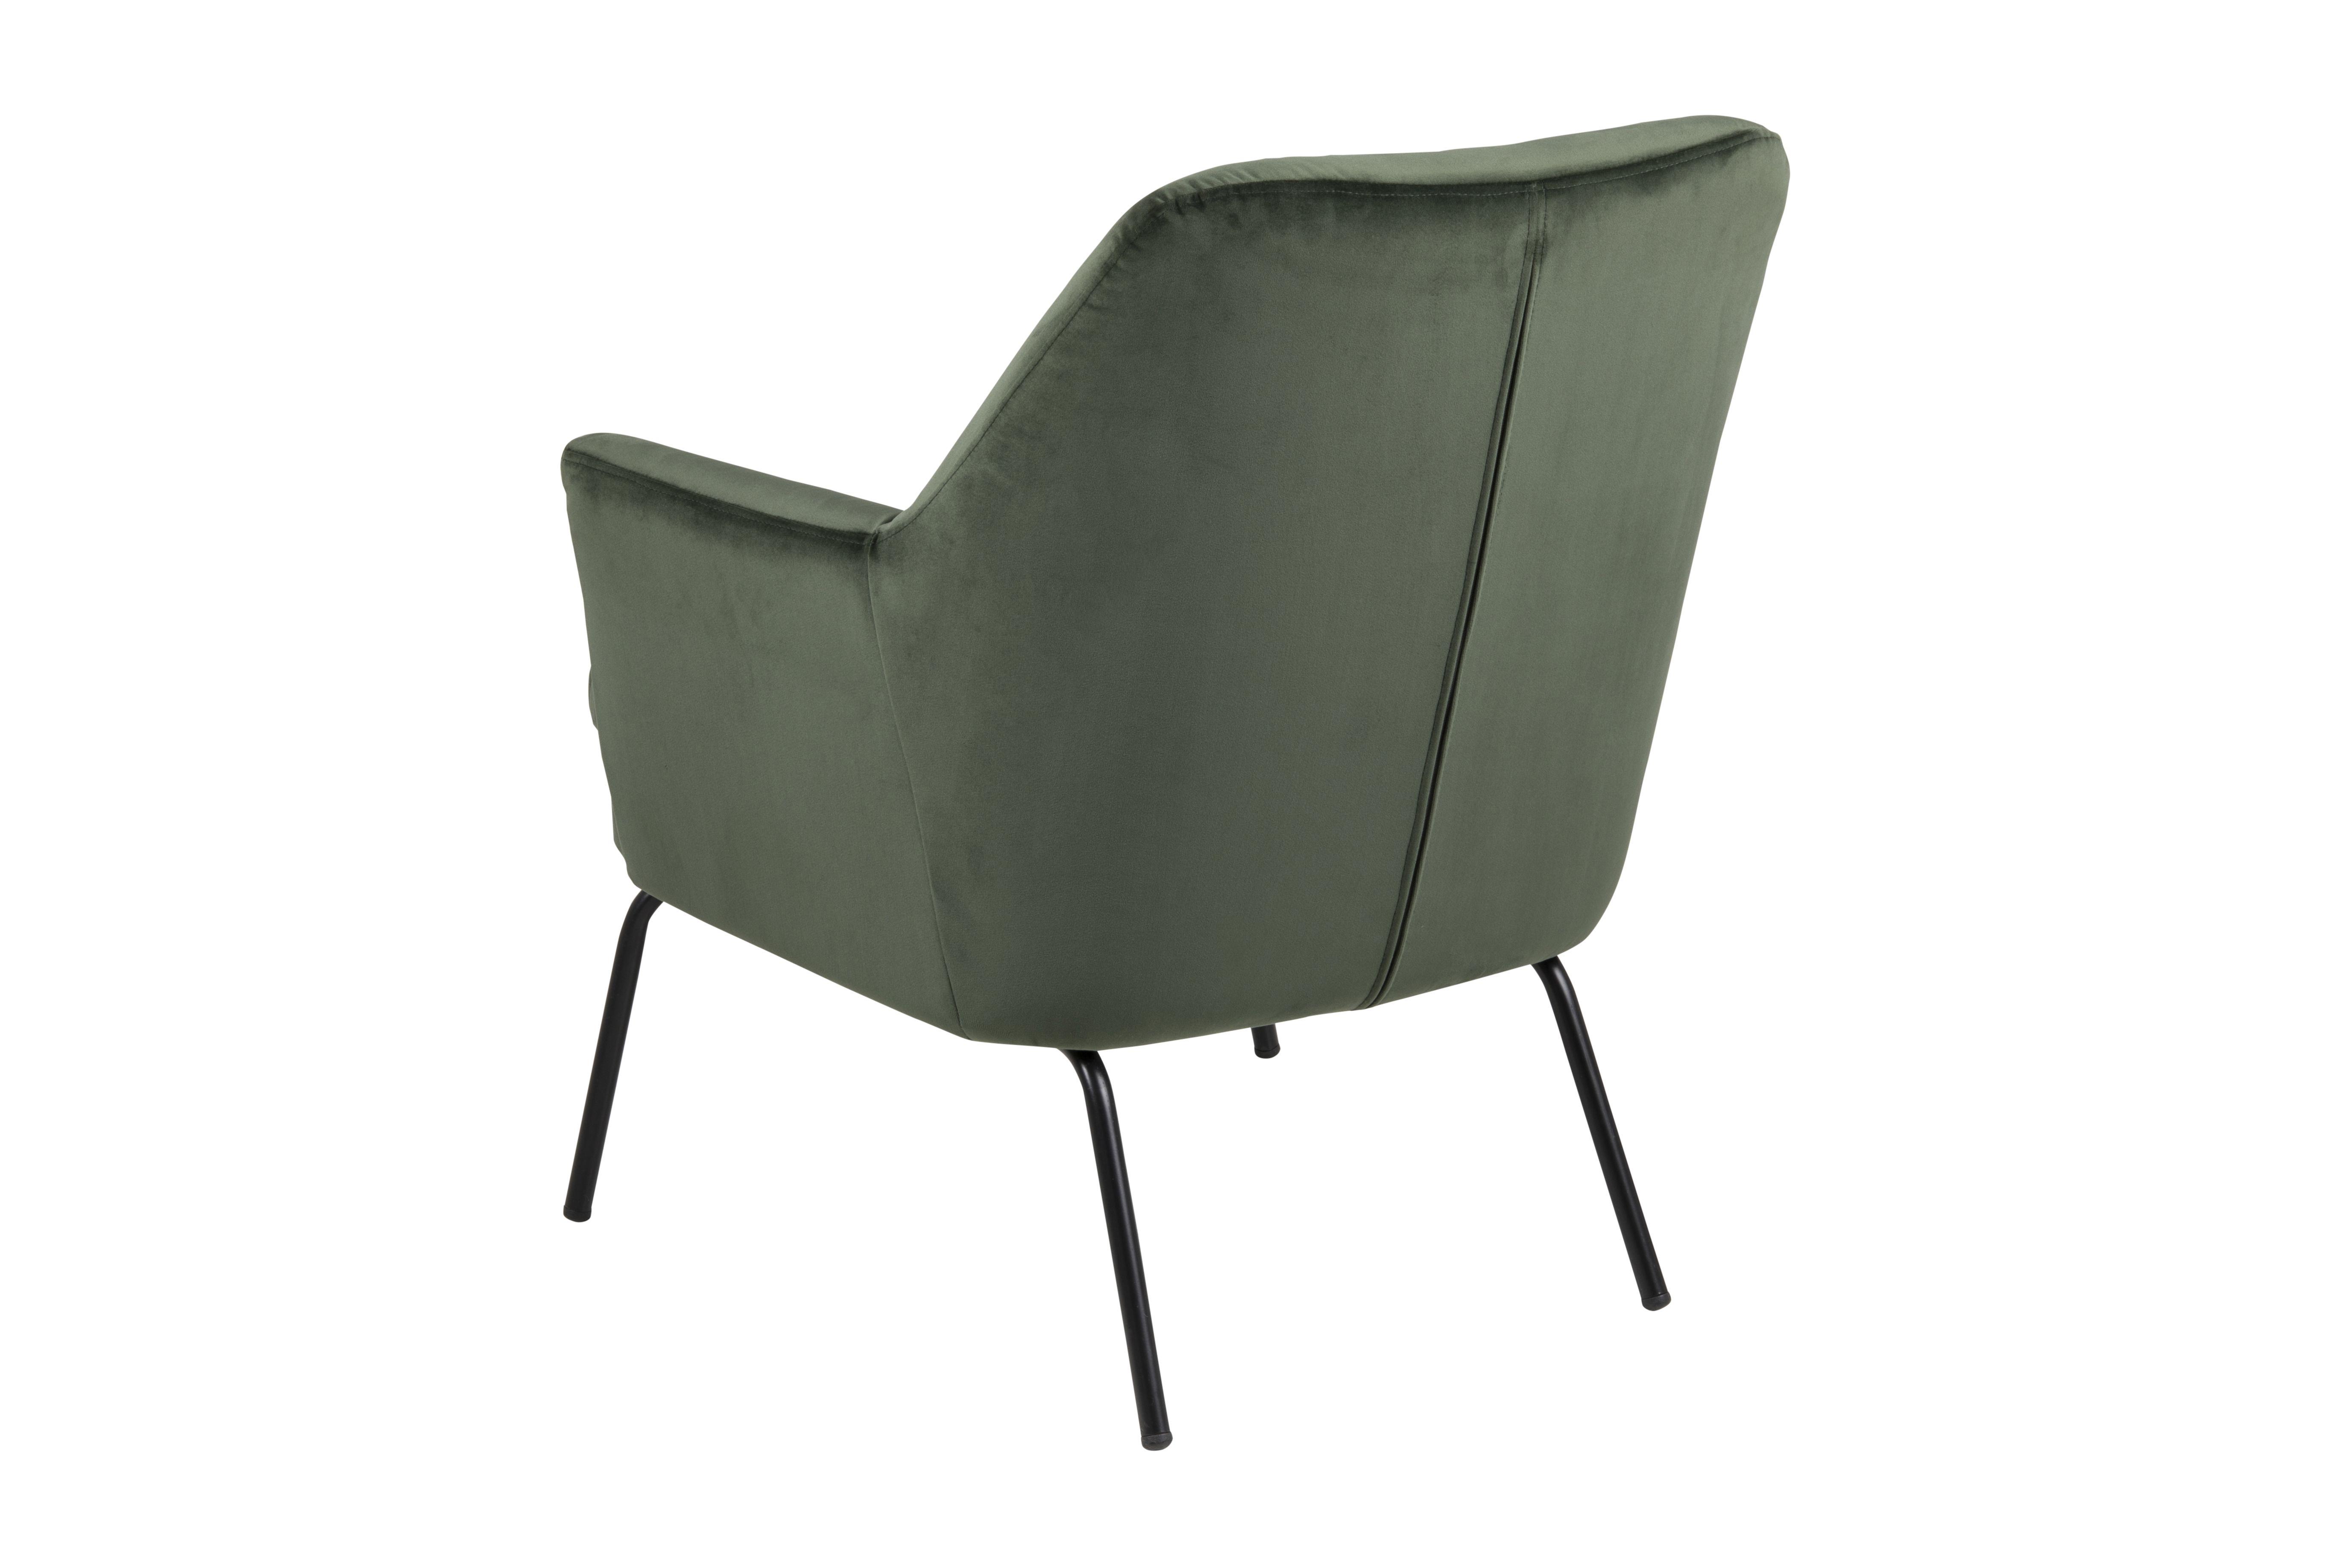 forlev-groen-1